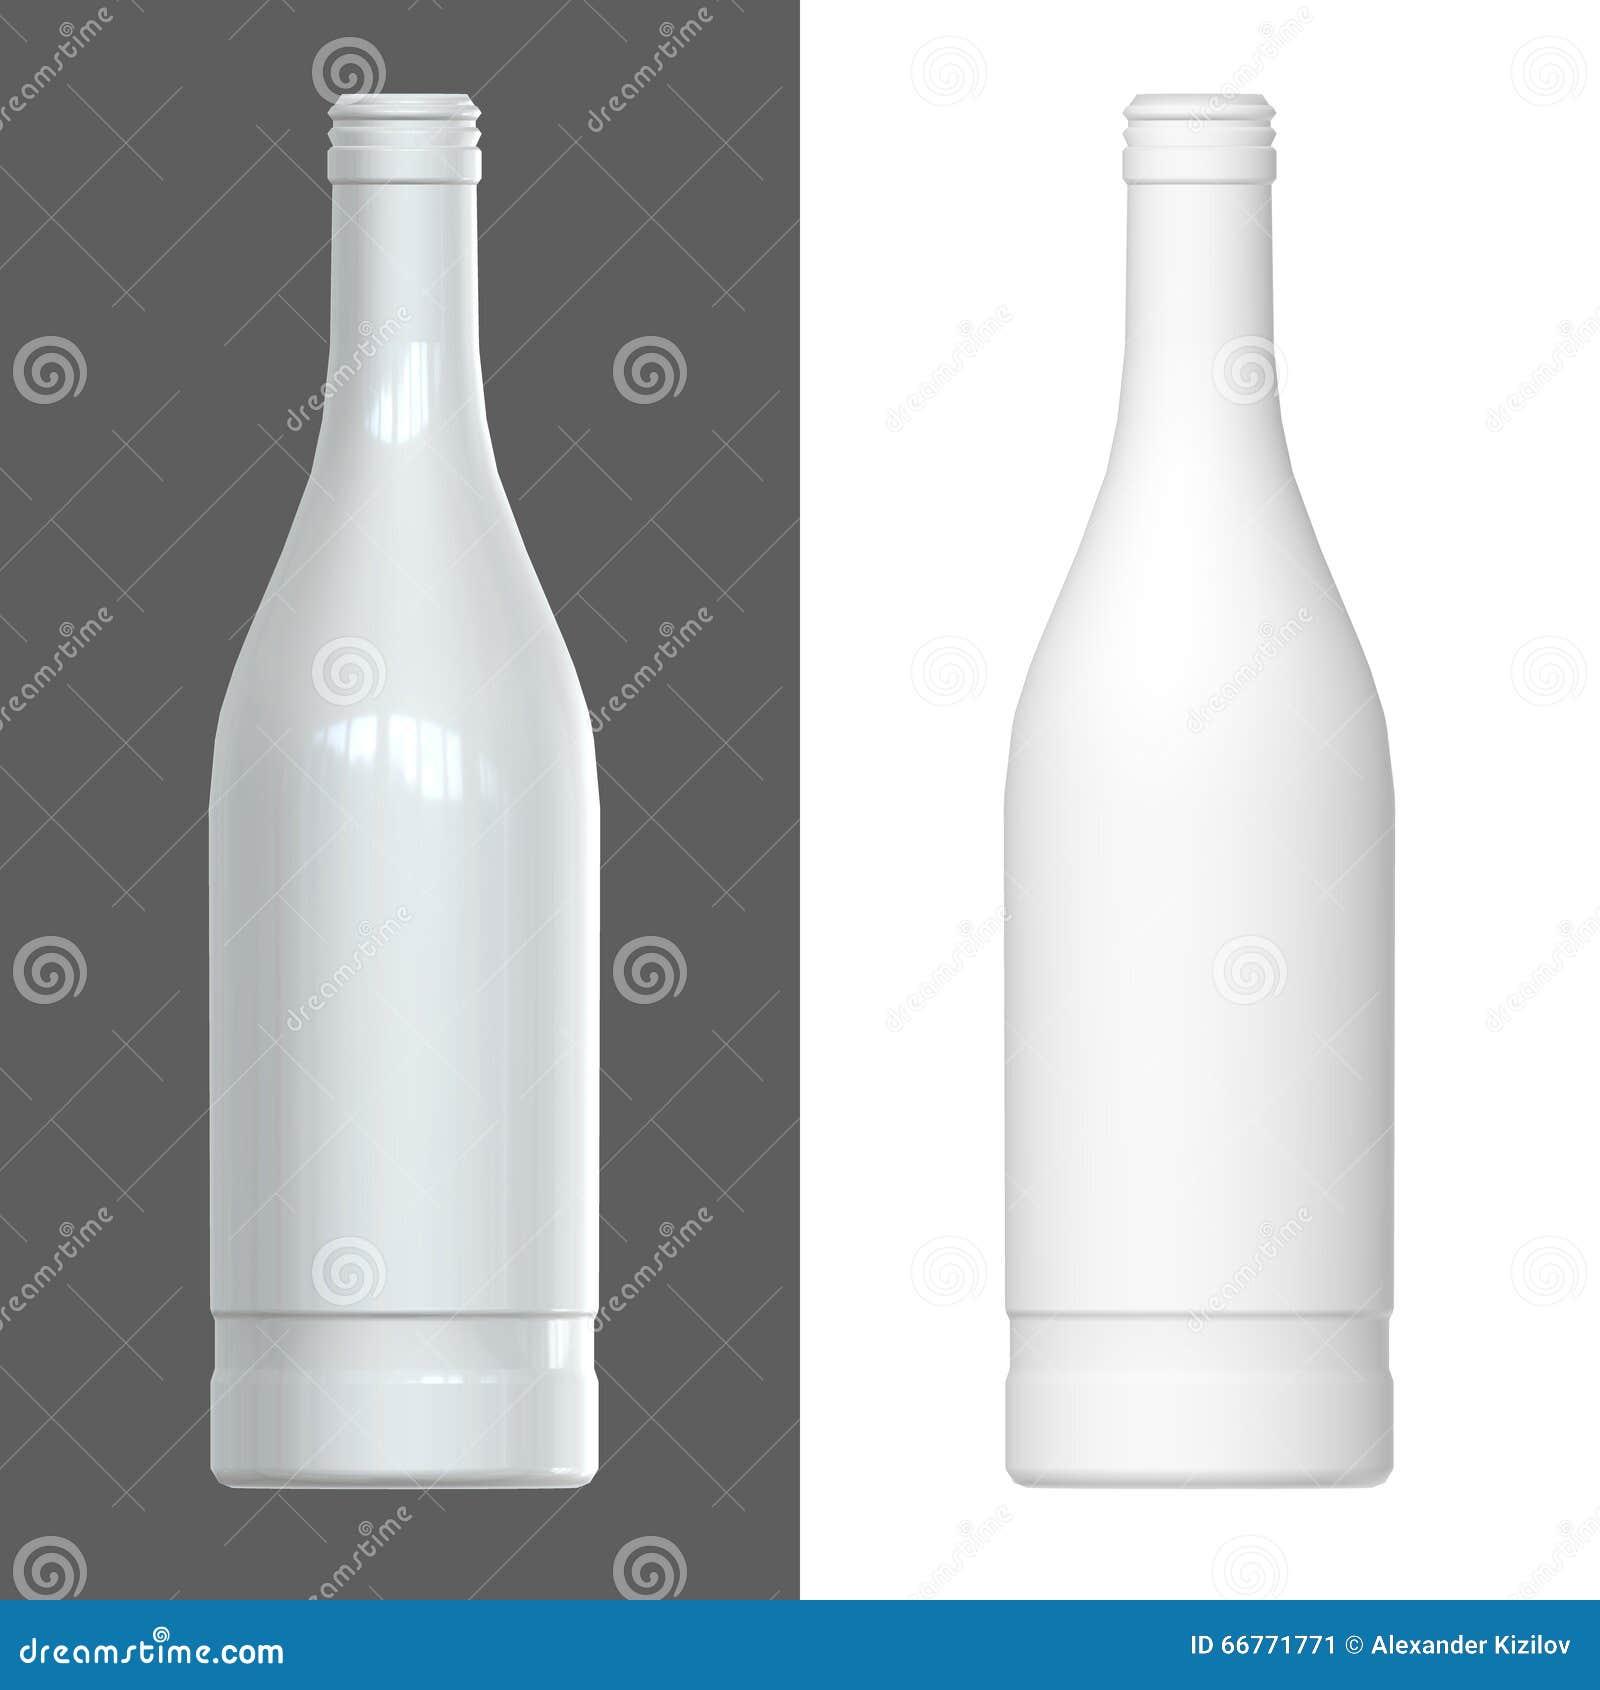 Bottle Template. 3D Render. Stock Illustration - Illustration of ...